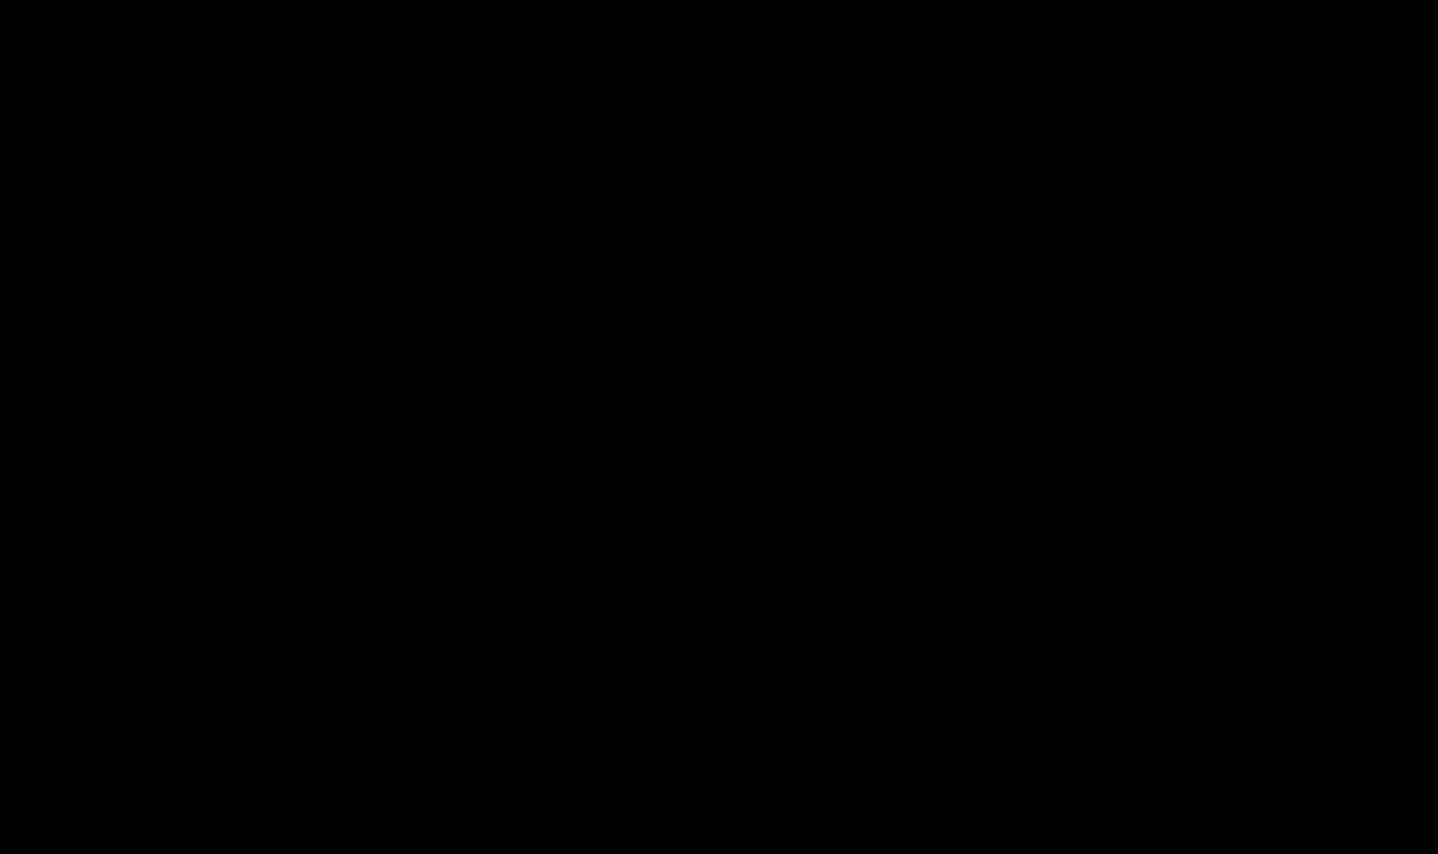 2-Fluoro-3-methyl-4-tetrahydropyranoxybenzeneboronic acid pinacol ester